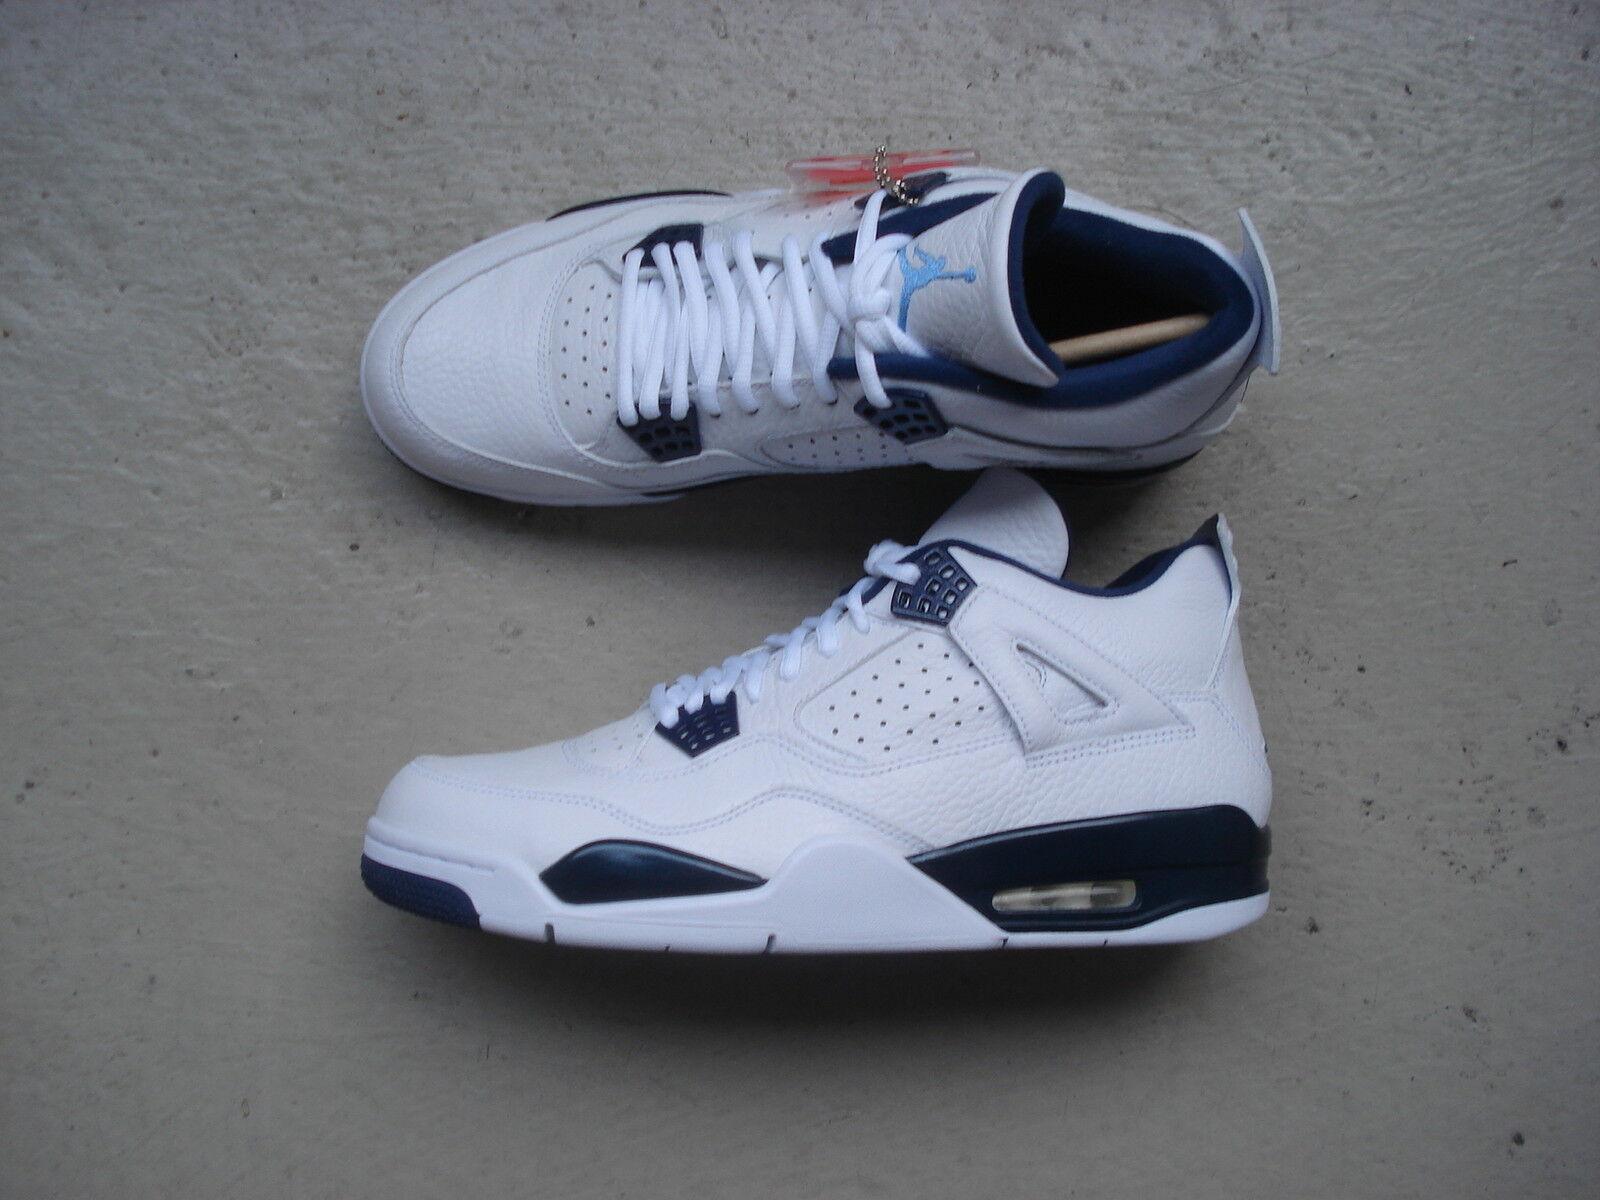 Nike Air Jordan 4/iv AzulMidnight retro ls 45.5 Blanco/Legend AzulMidnight 4/iv Navy 48e45c